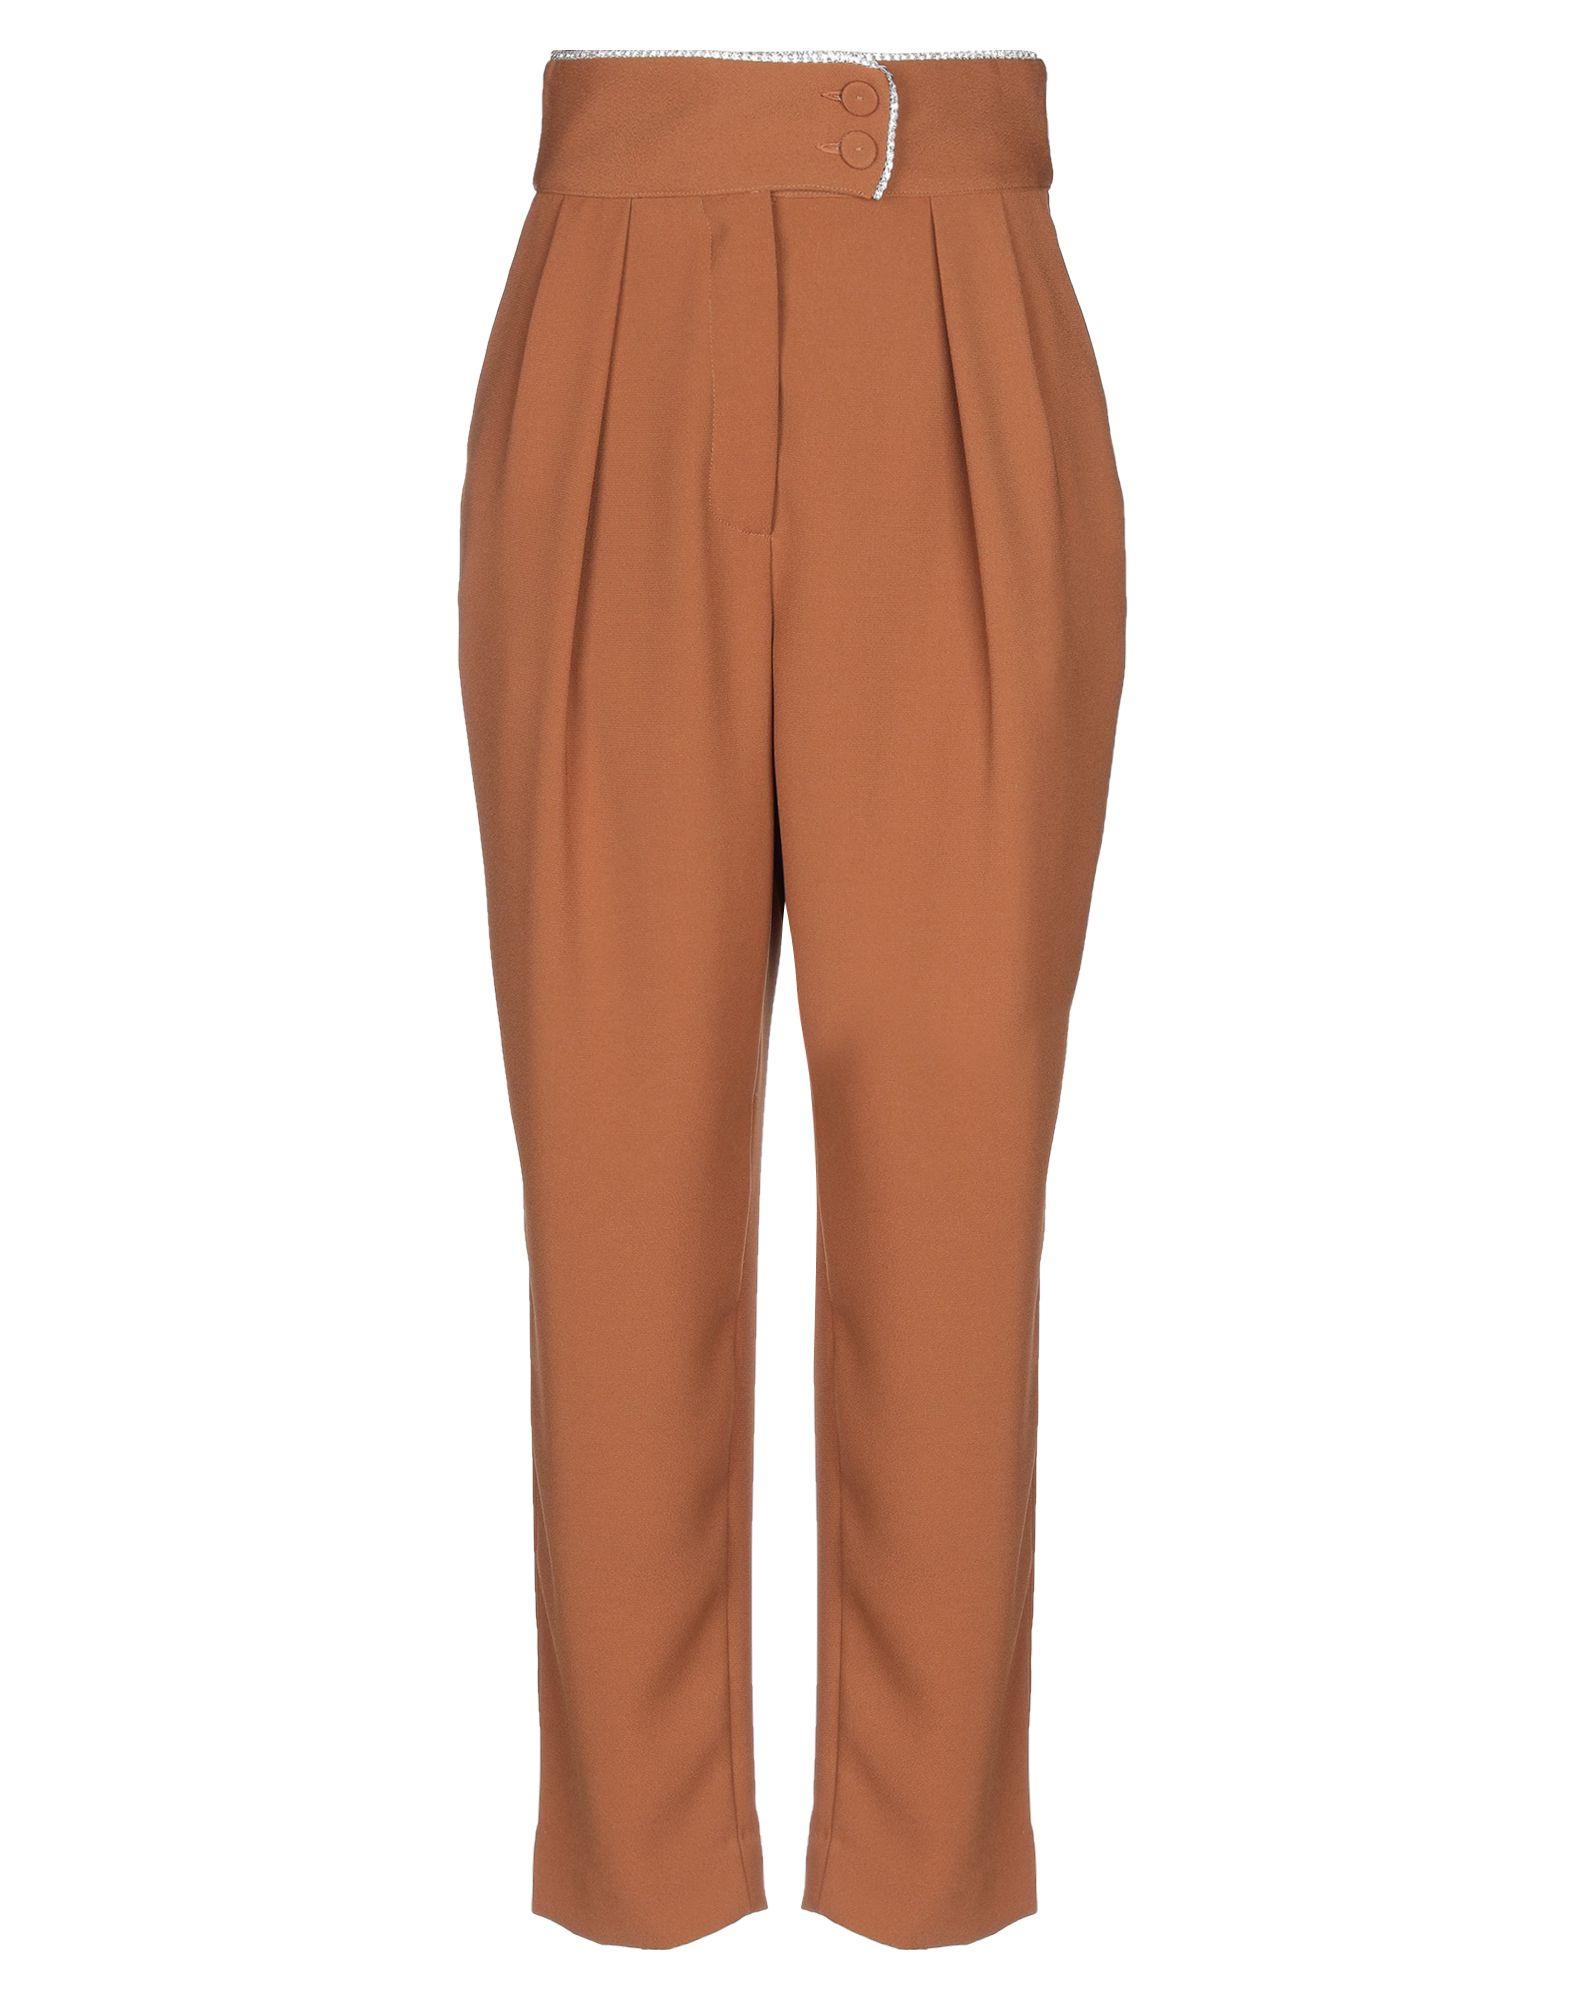 SE-TA Rosy Iacovone Повседневные брюки